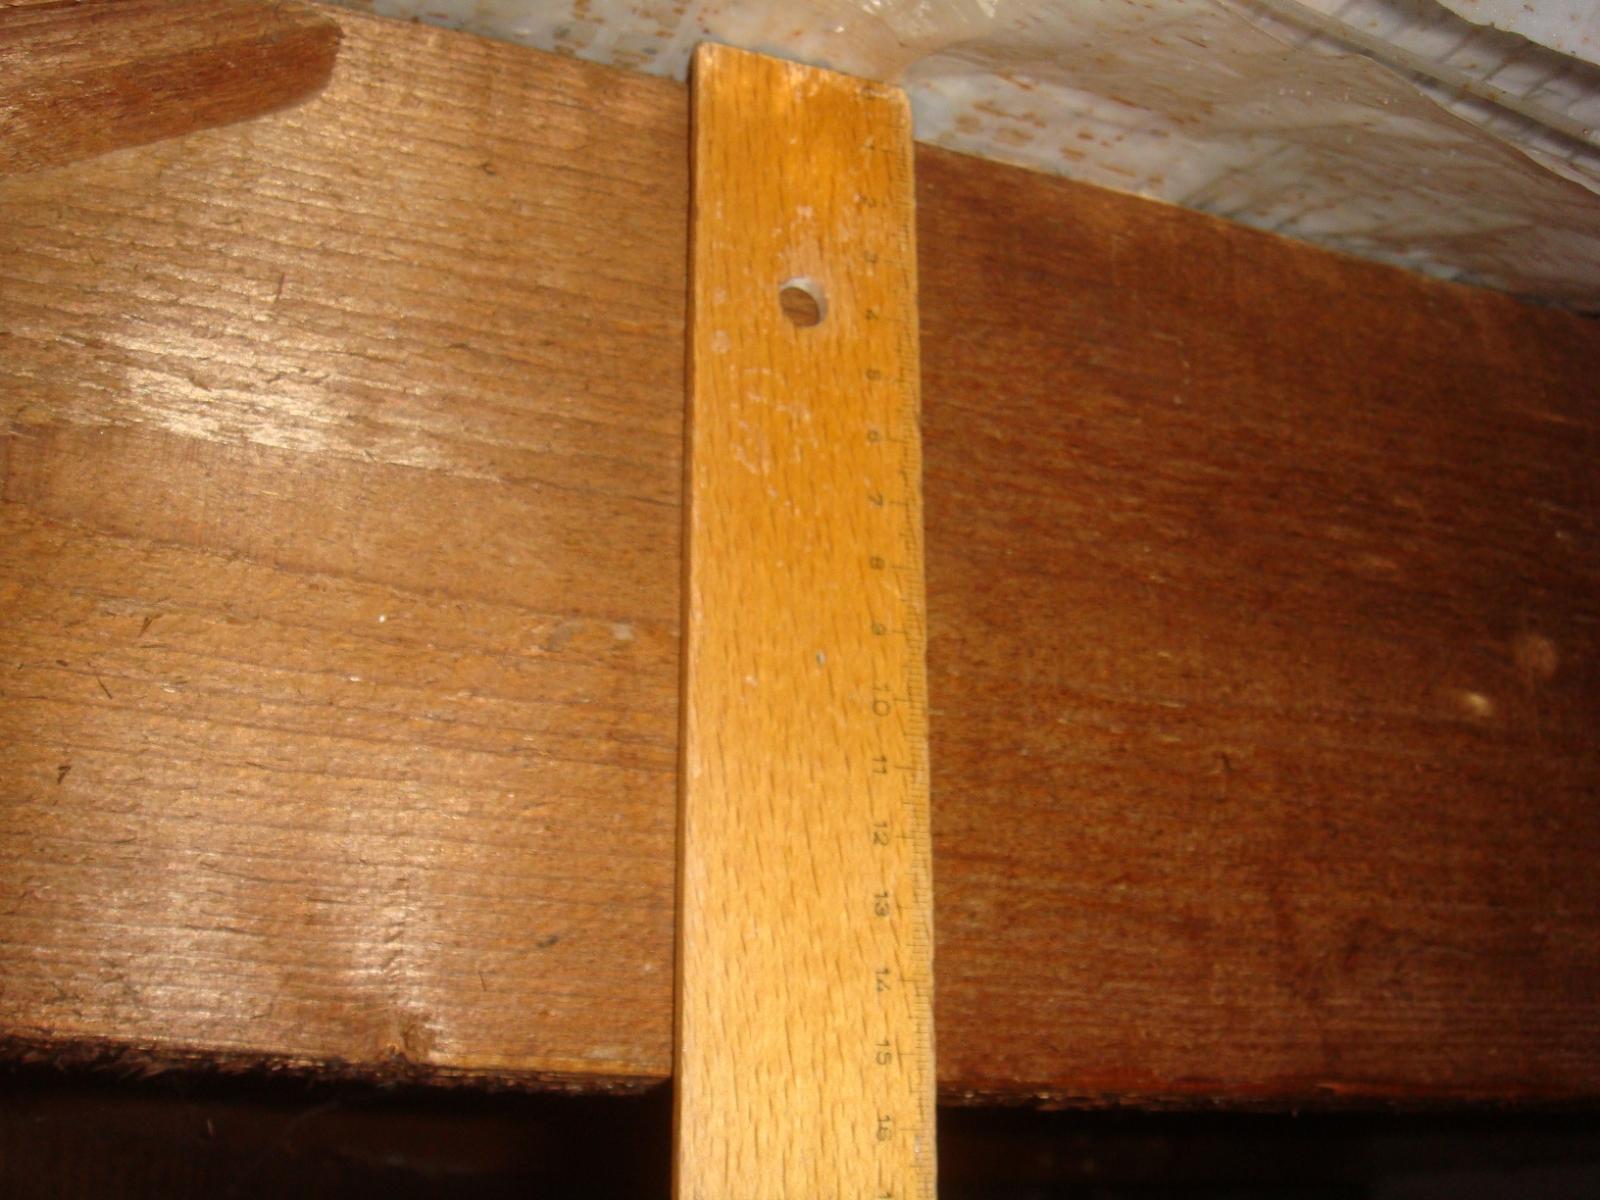 Fußboden Im Dachboden ~ Fingers elektrische welt u2022 thema anzeigen dachboden fußboden: loch